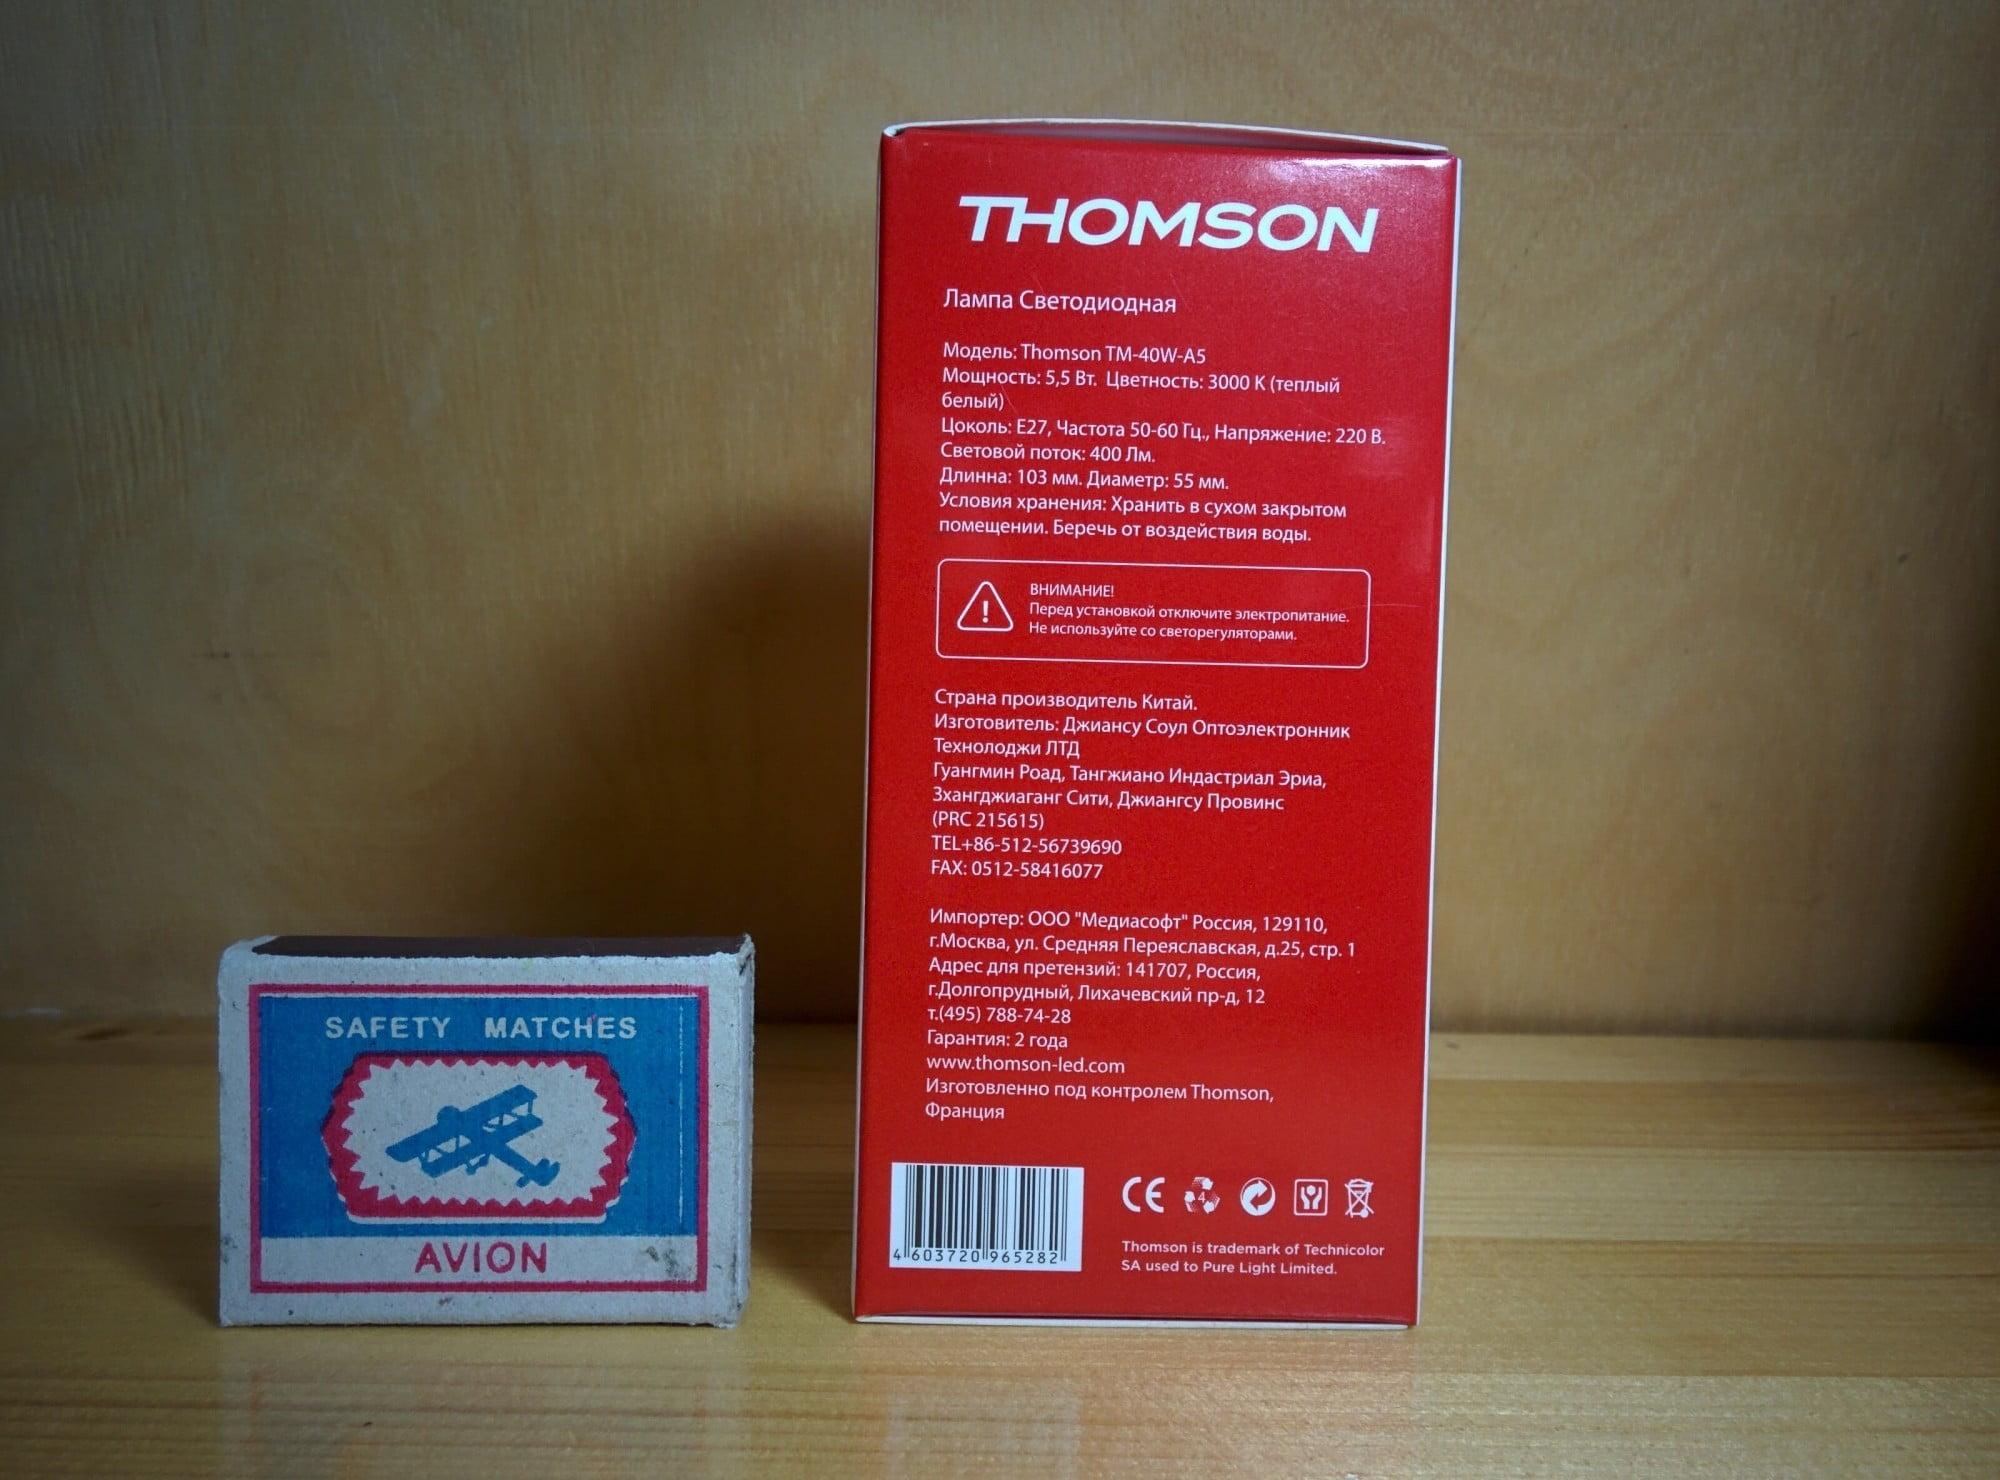 Thomson TM-40W-A5 характеристики